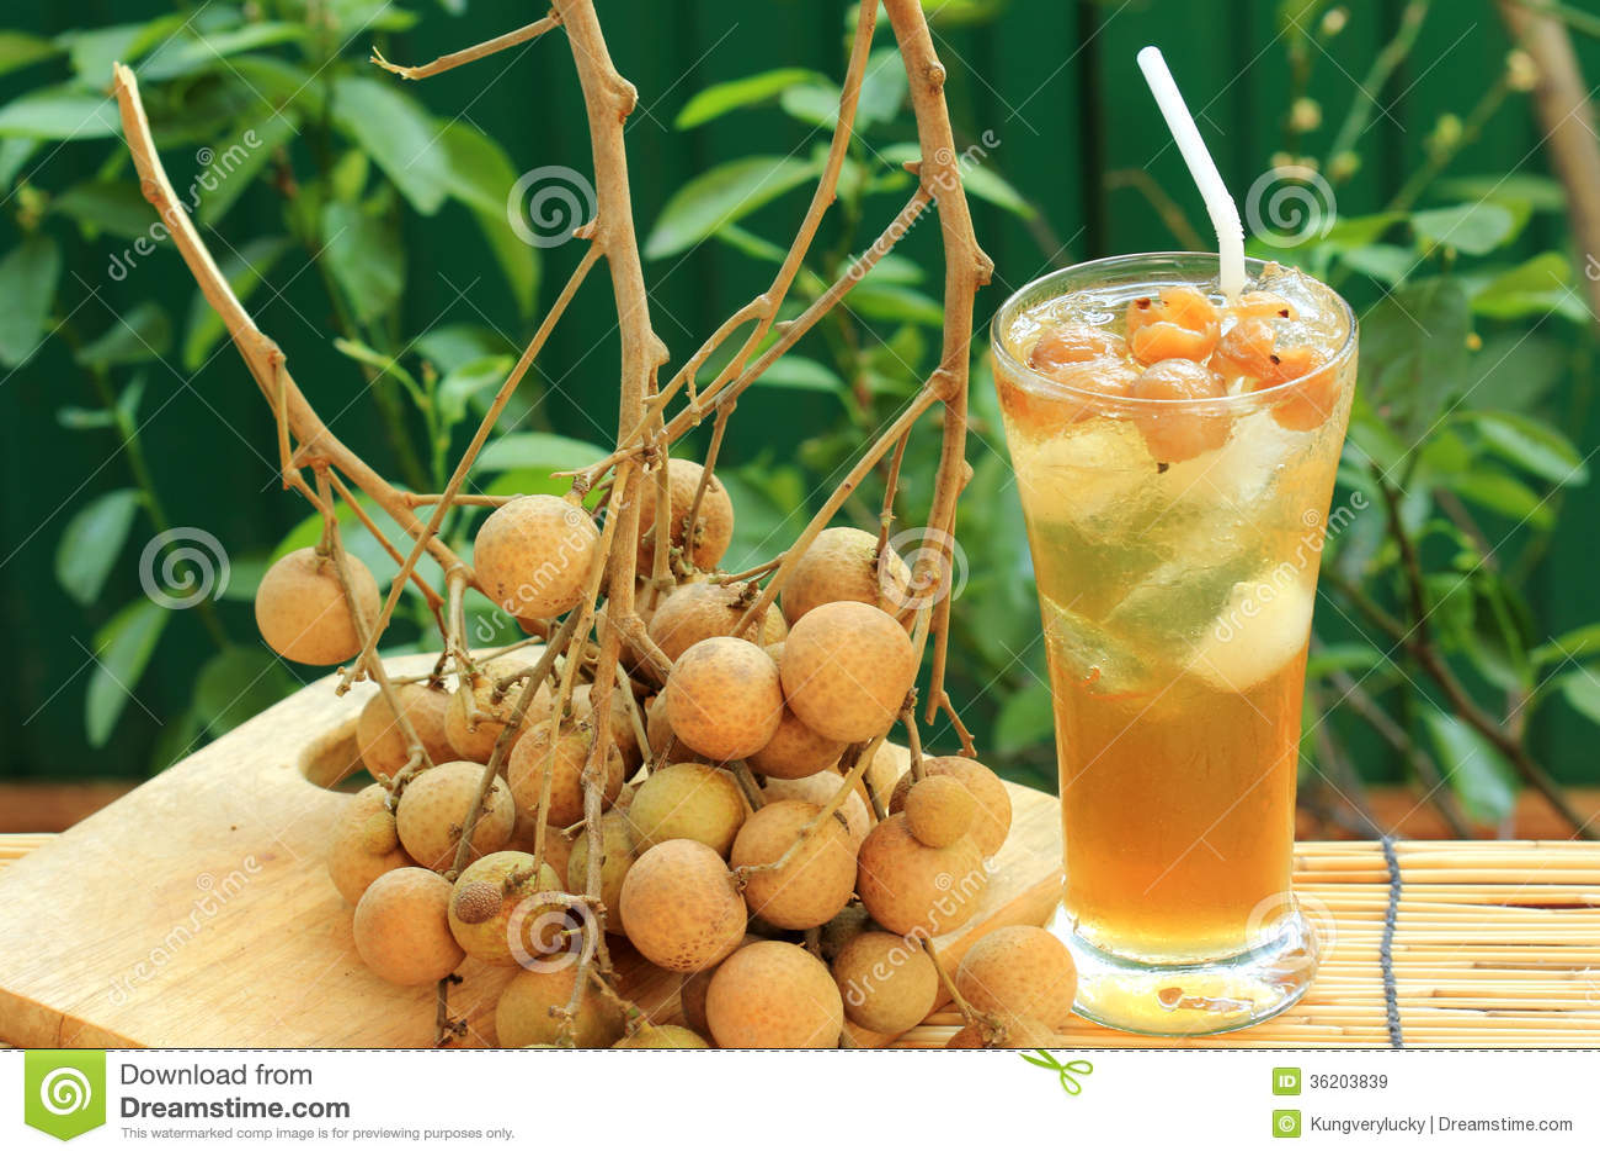 Longan Juice Cold Water Royalty Free Stock Images Image